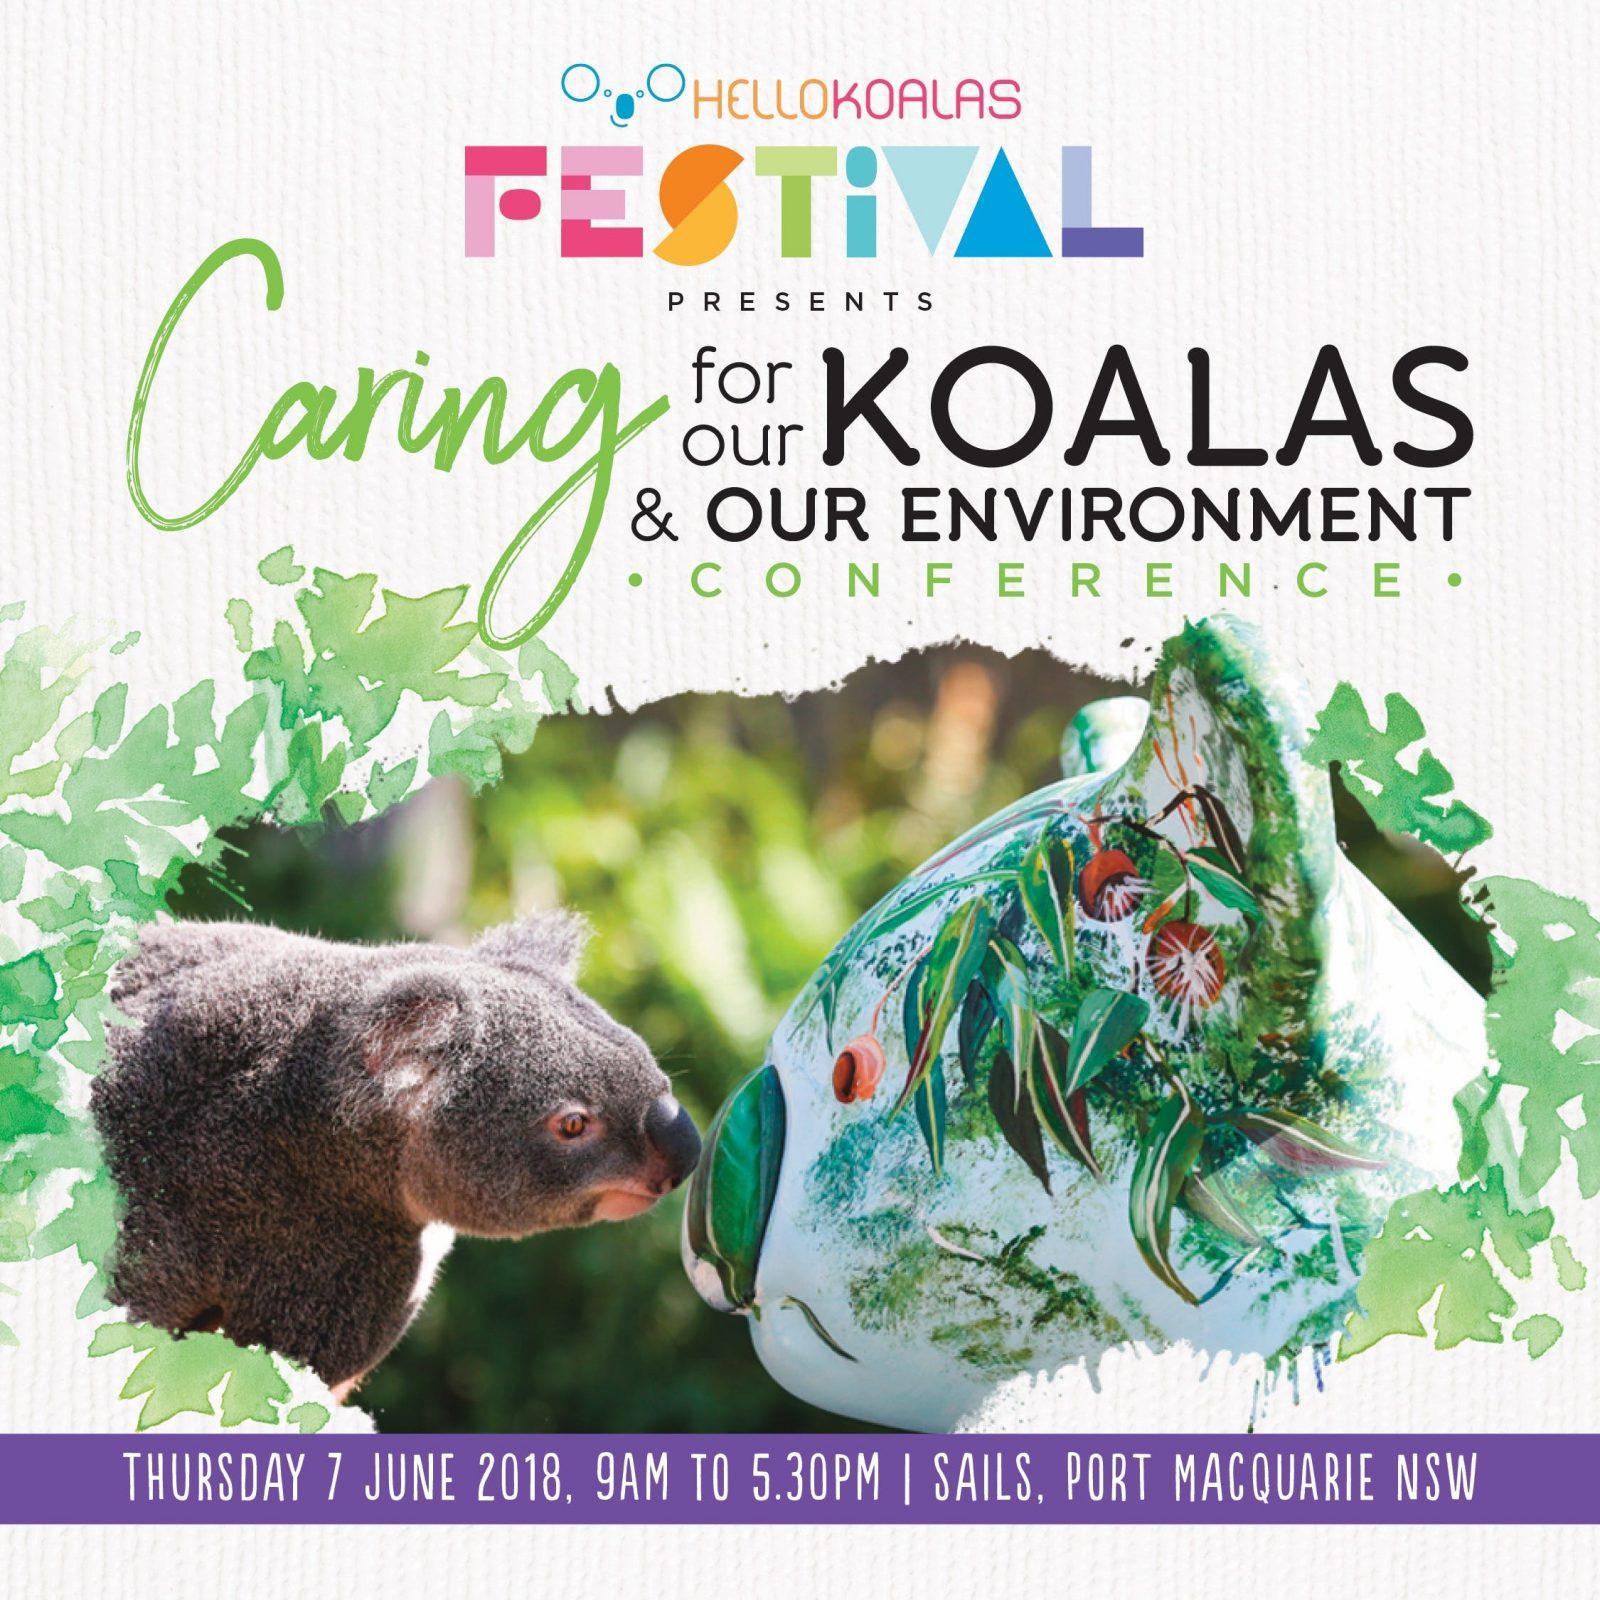 a conference about koala conservation